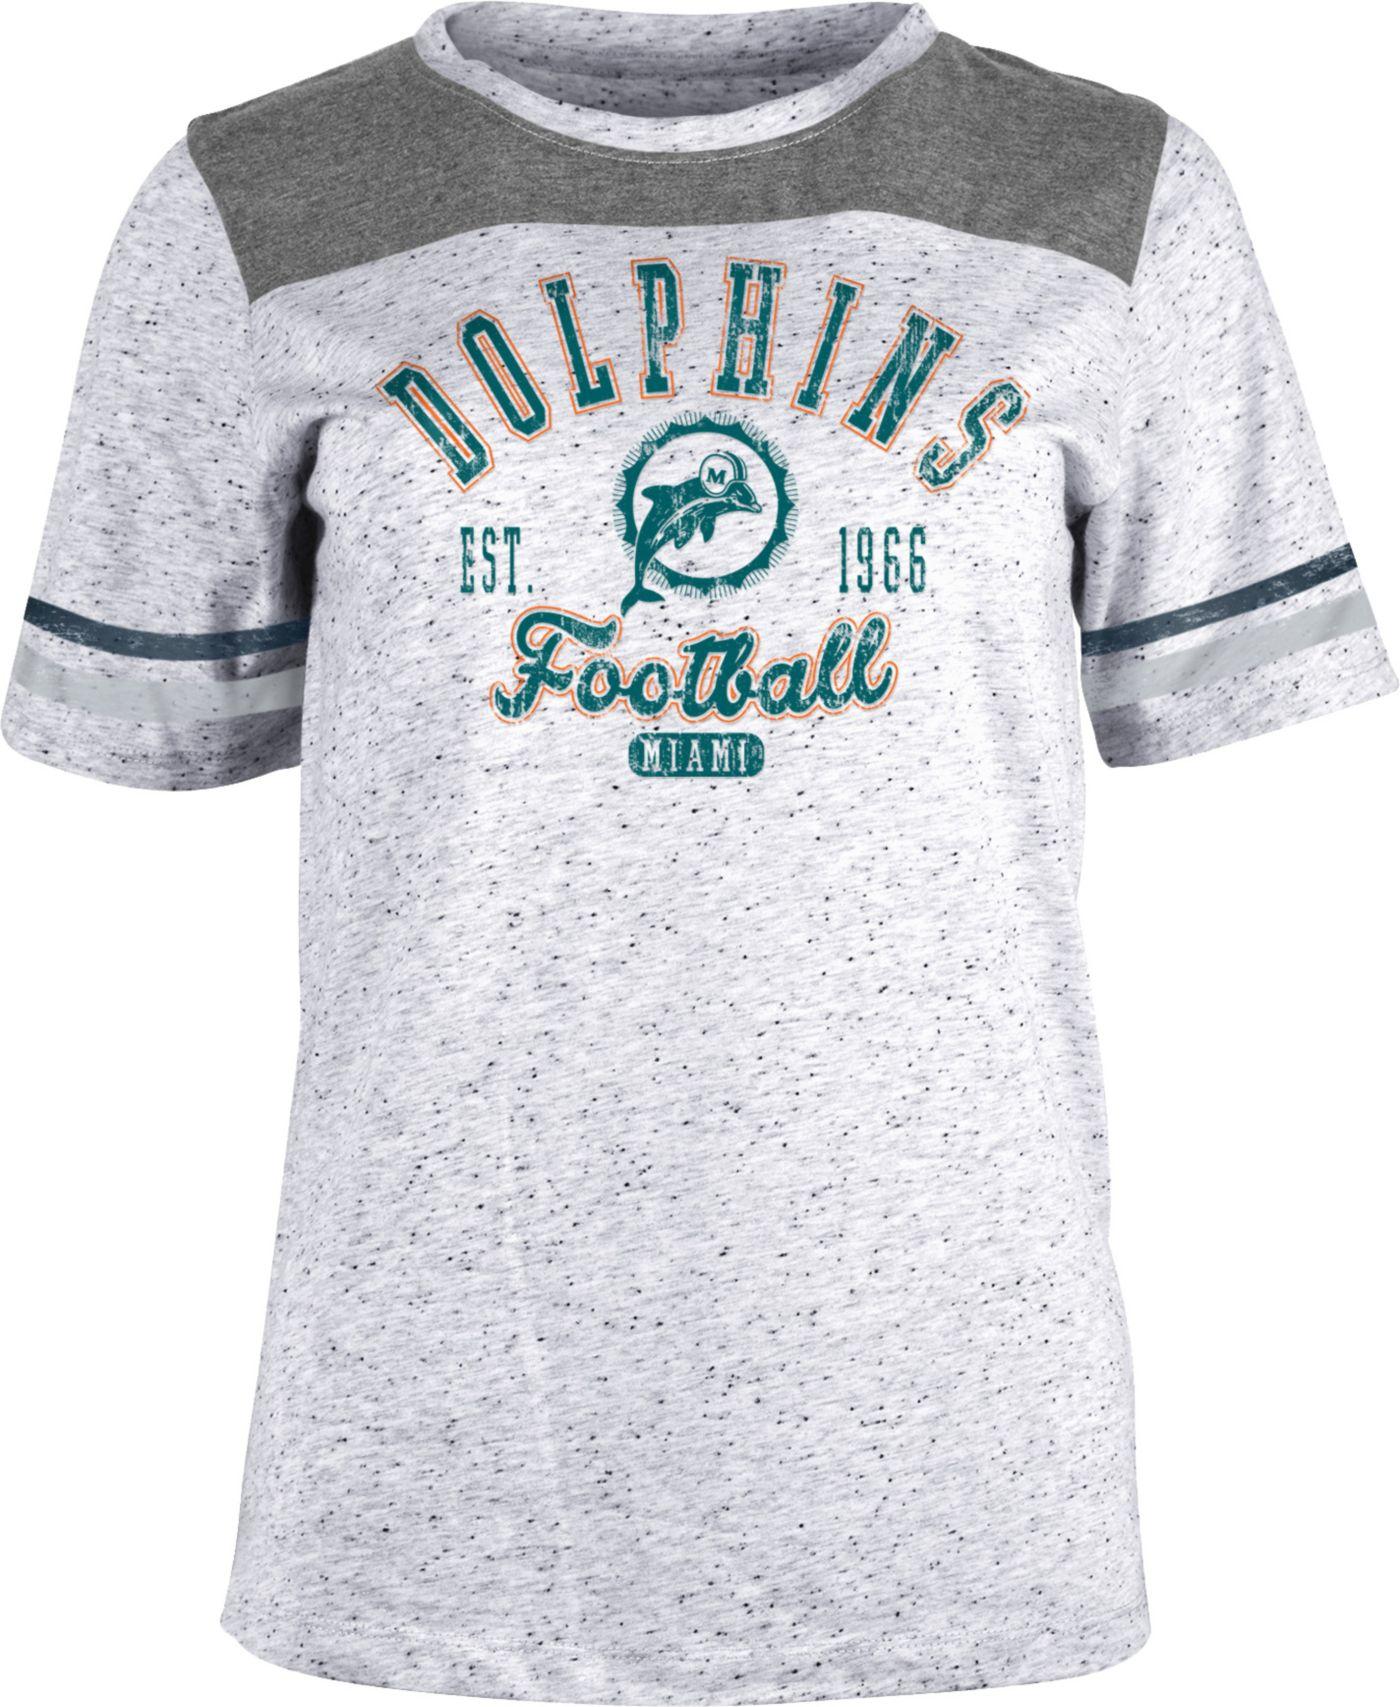 NFL Team Apparel Women's Miami Dolphins Peppercorn T-Shirt